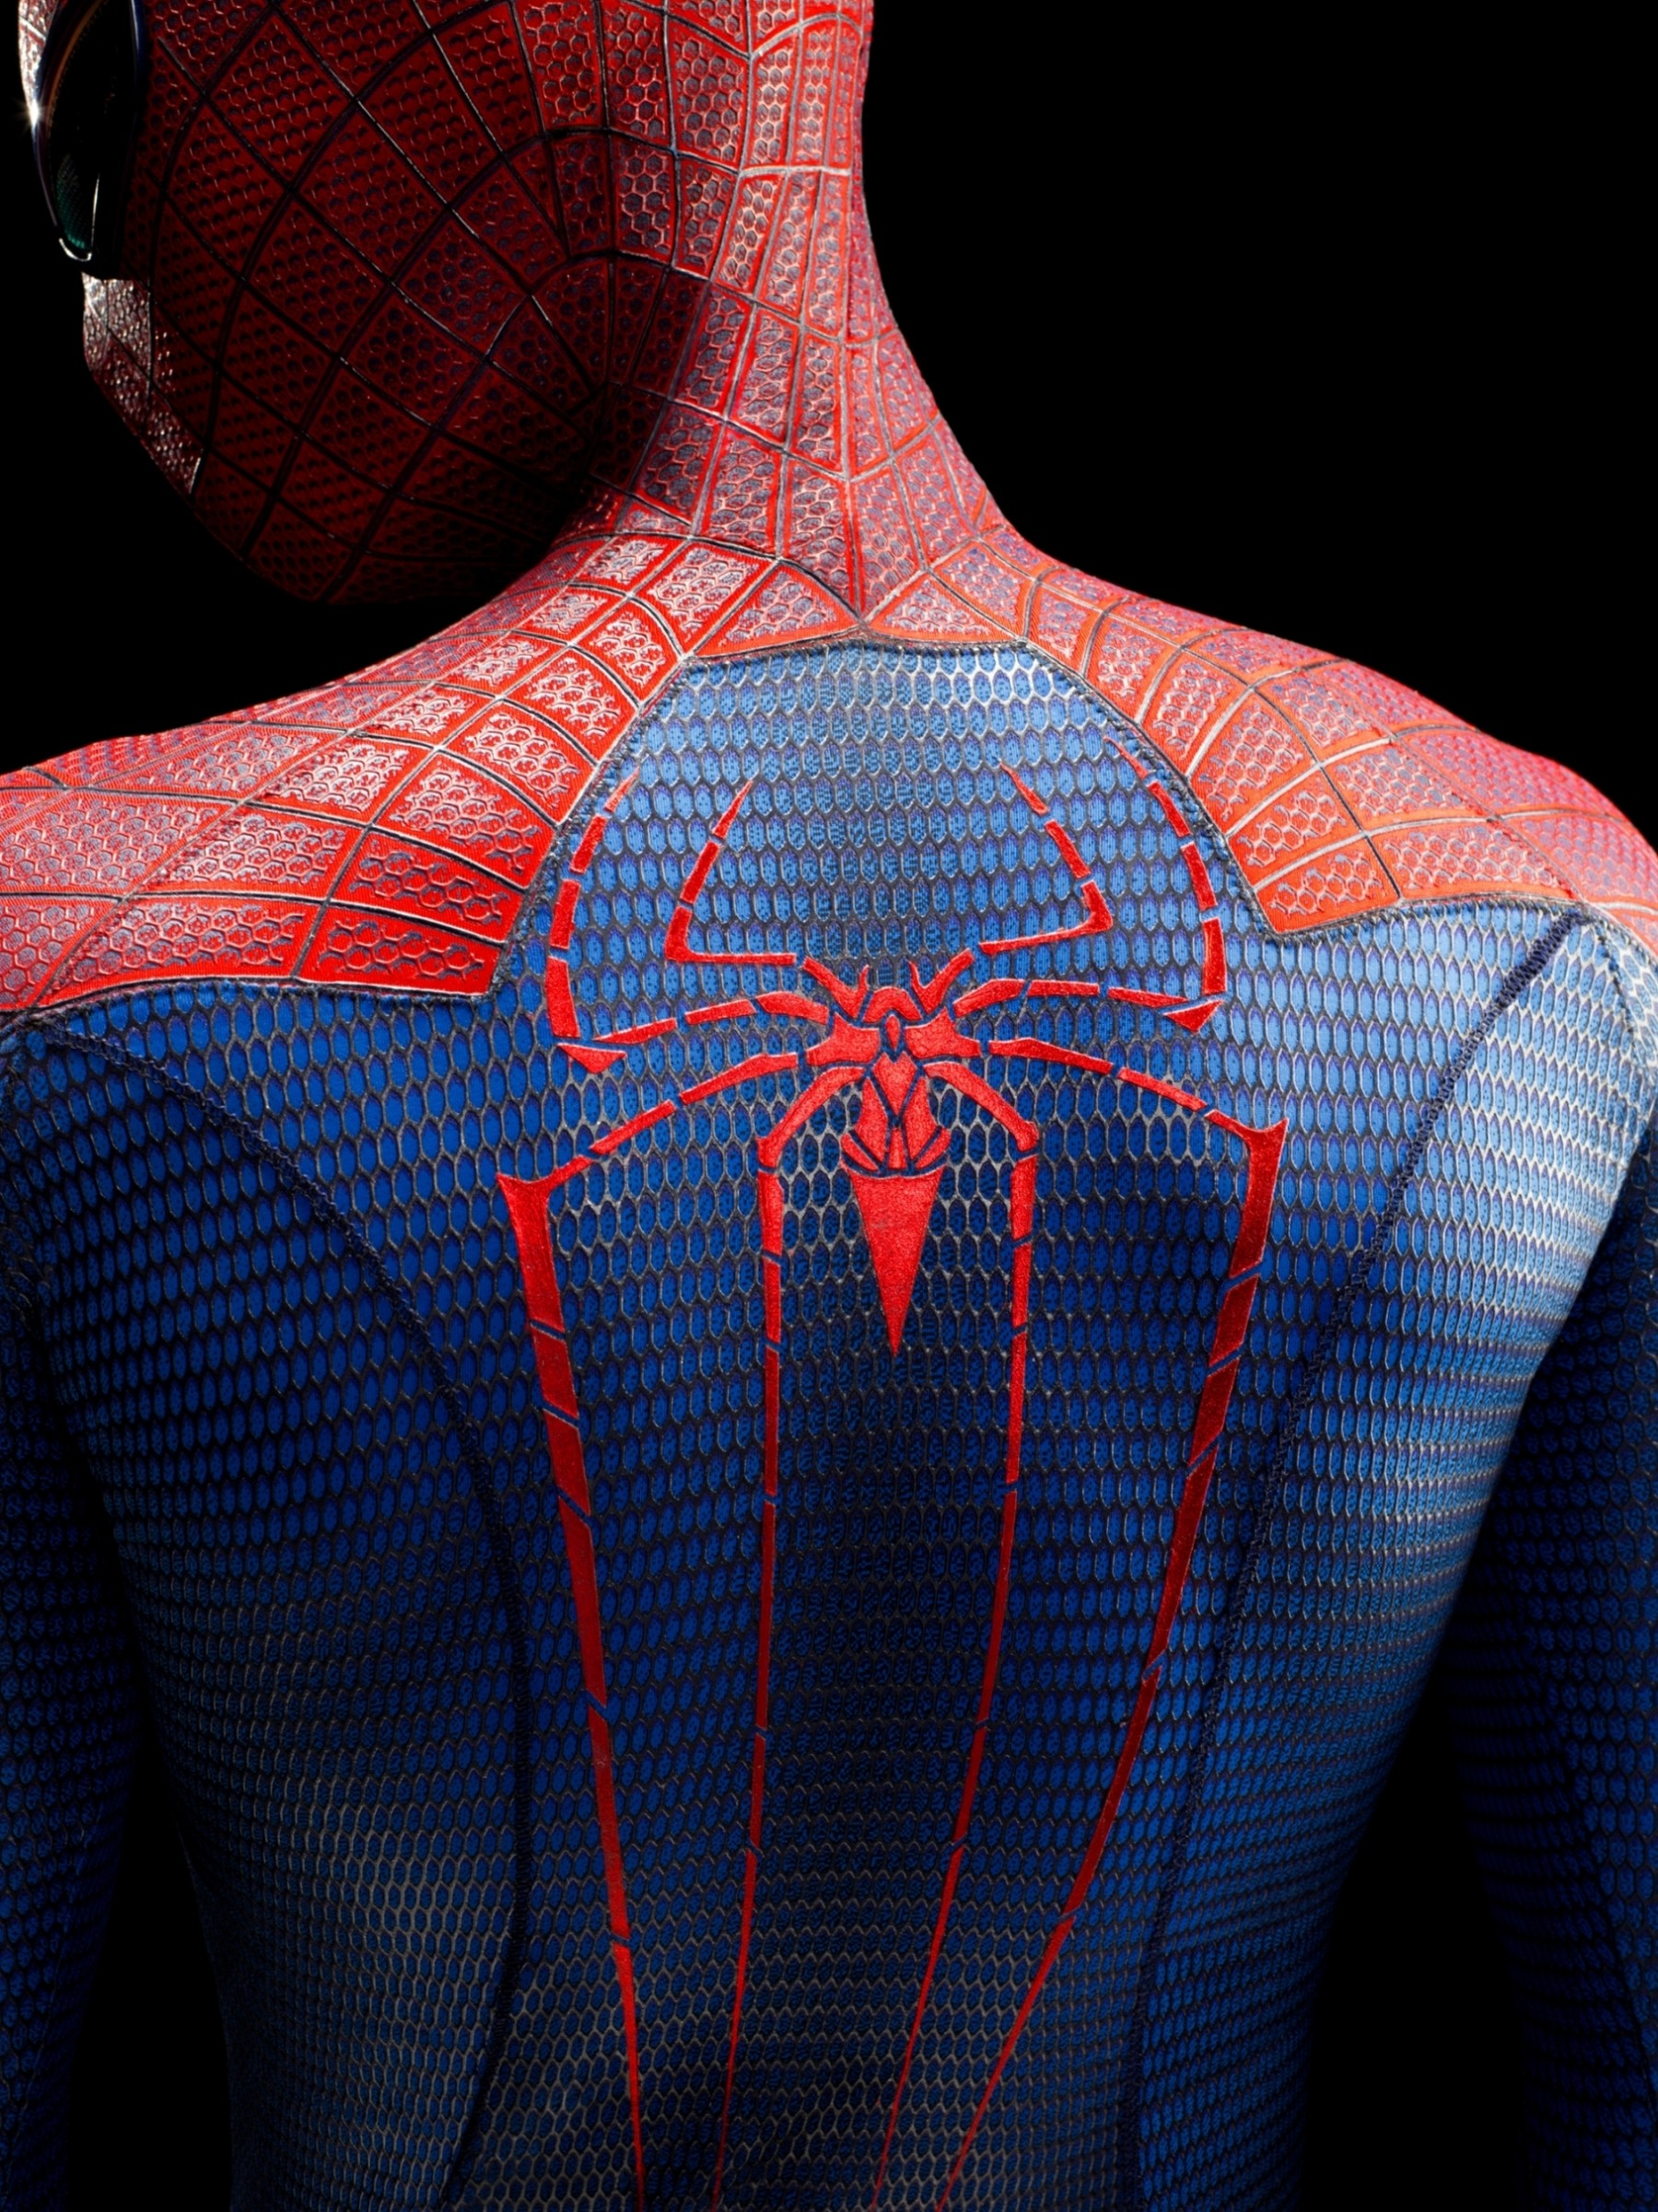 The-Amazing-Spider-Man 102d06bb.jpg